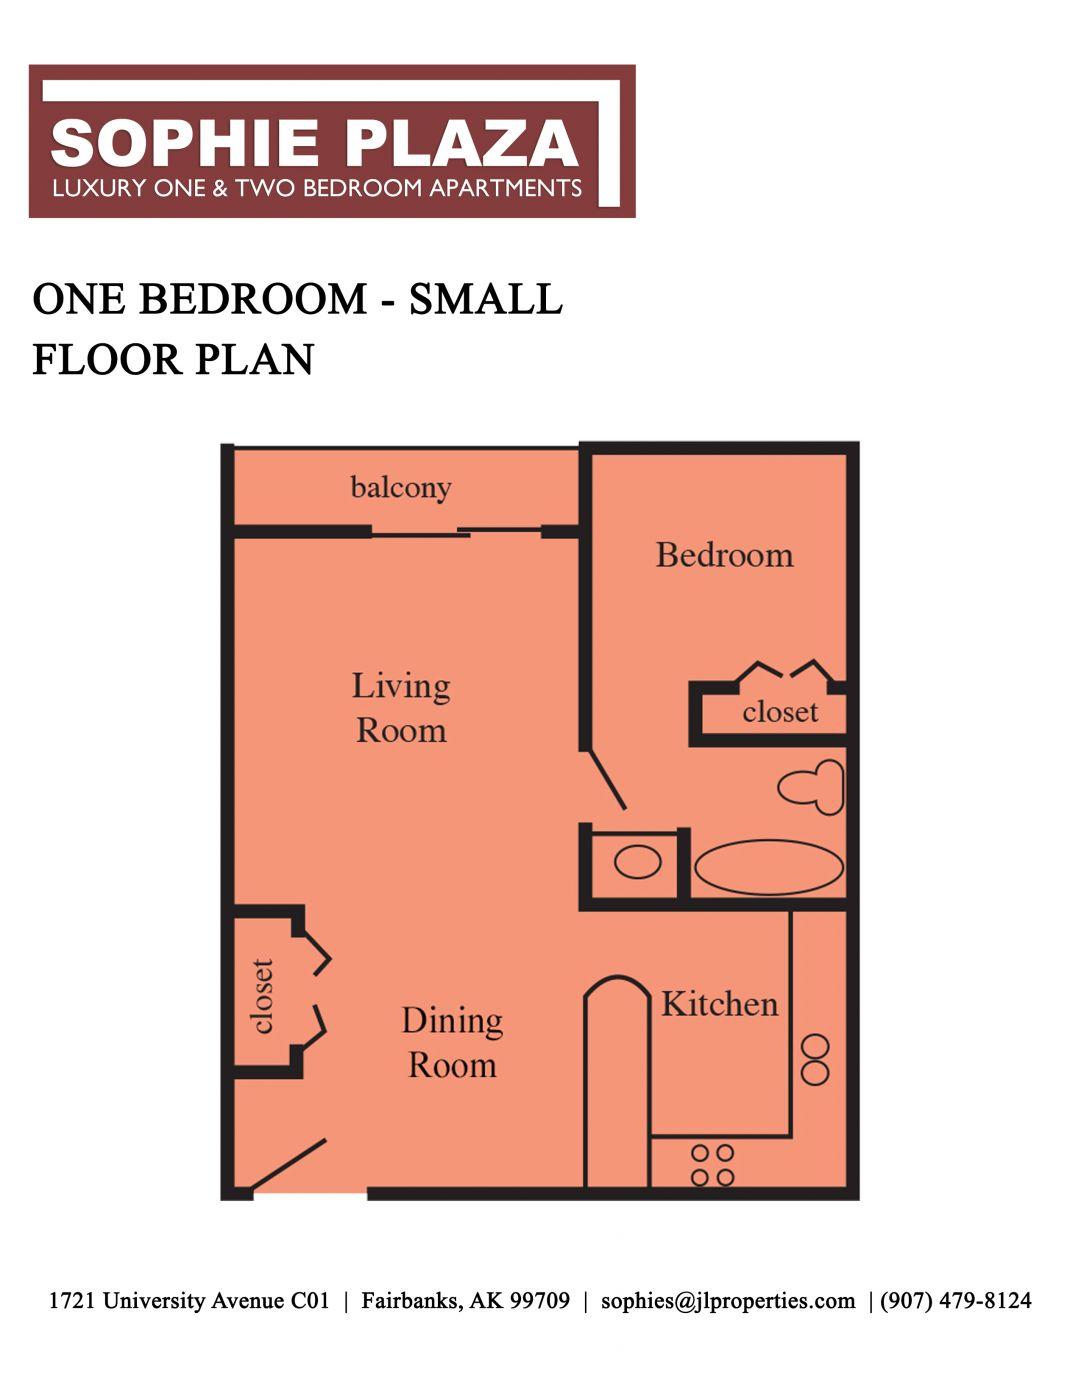 Fairbanks Alaska Apartments | Sophie Plaza | Maps and Floor ...